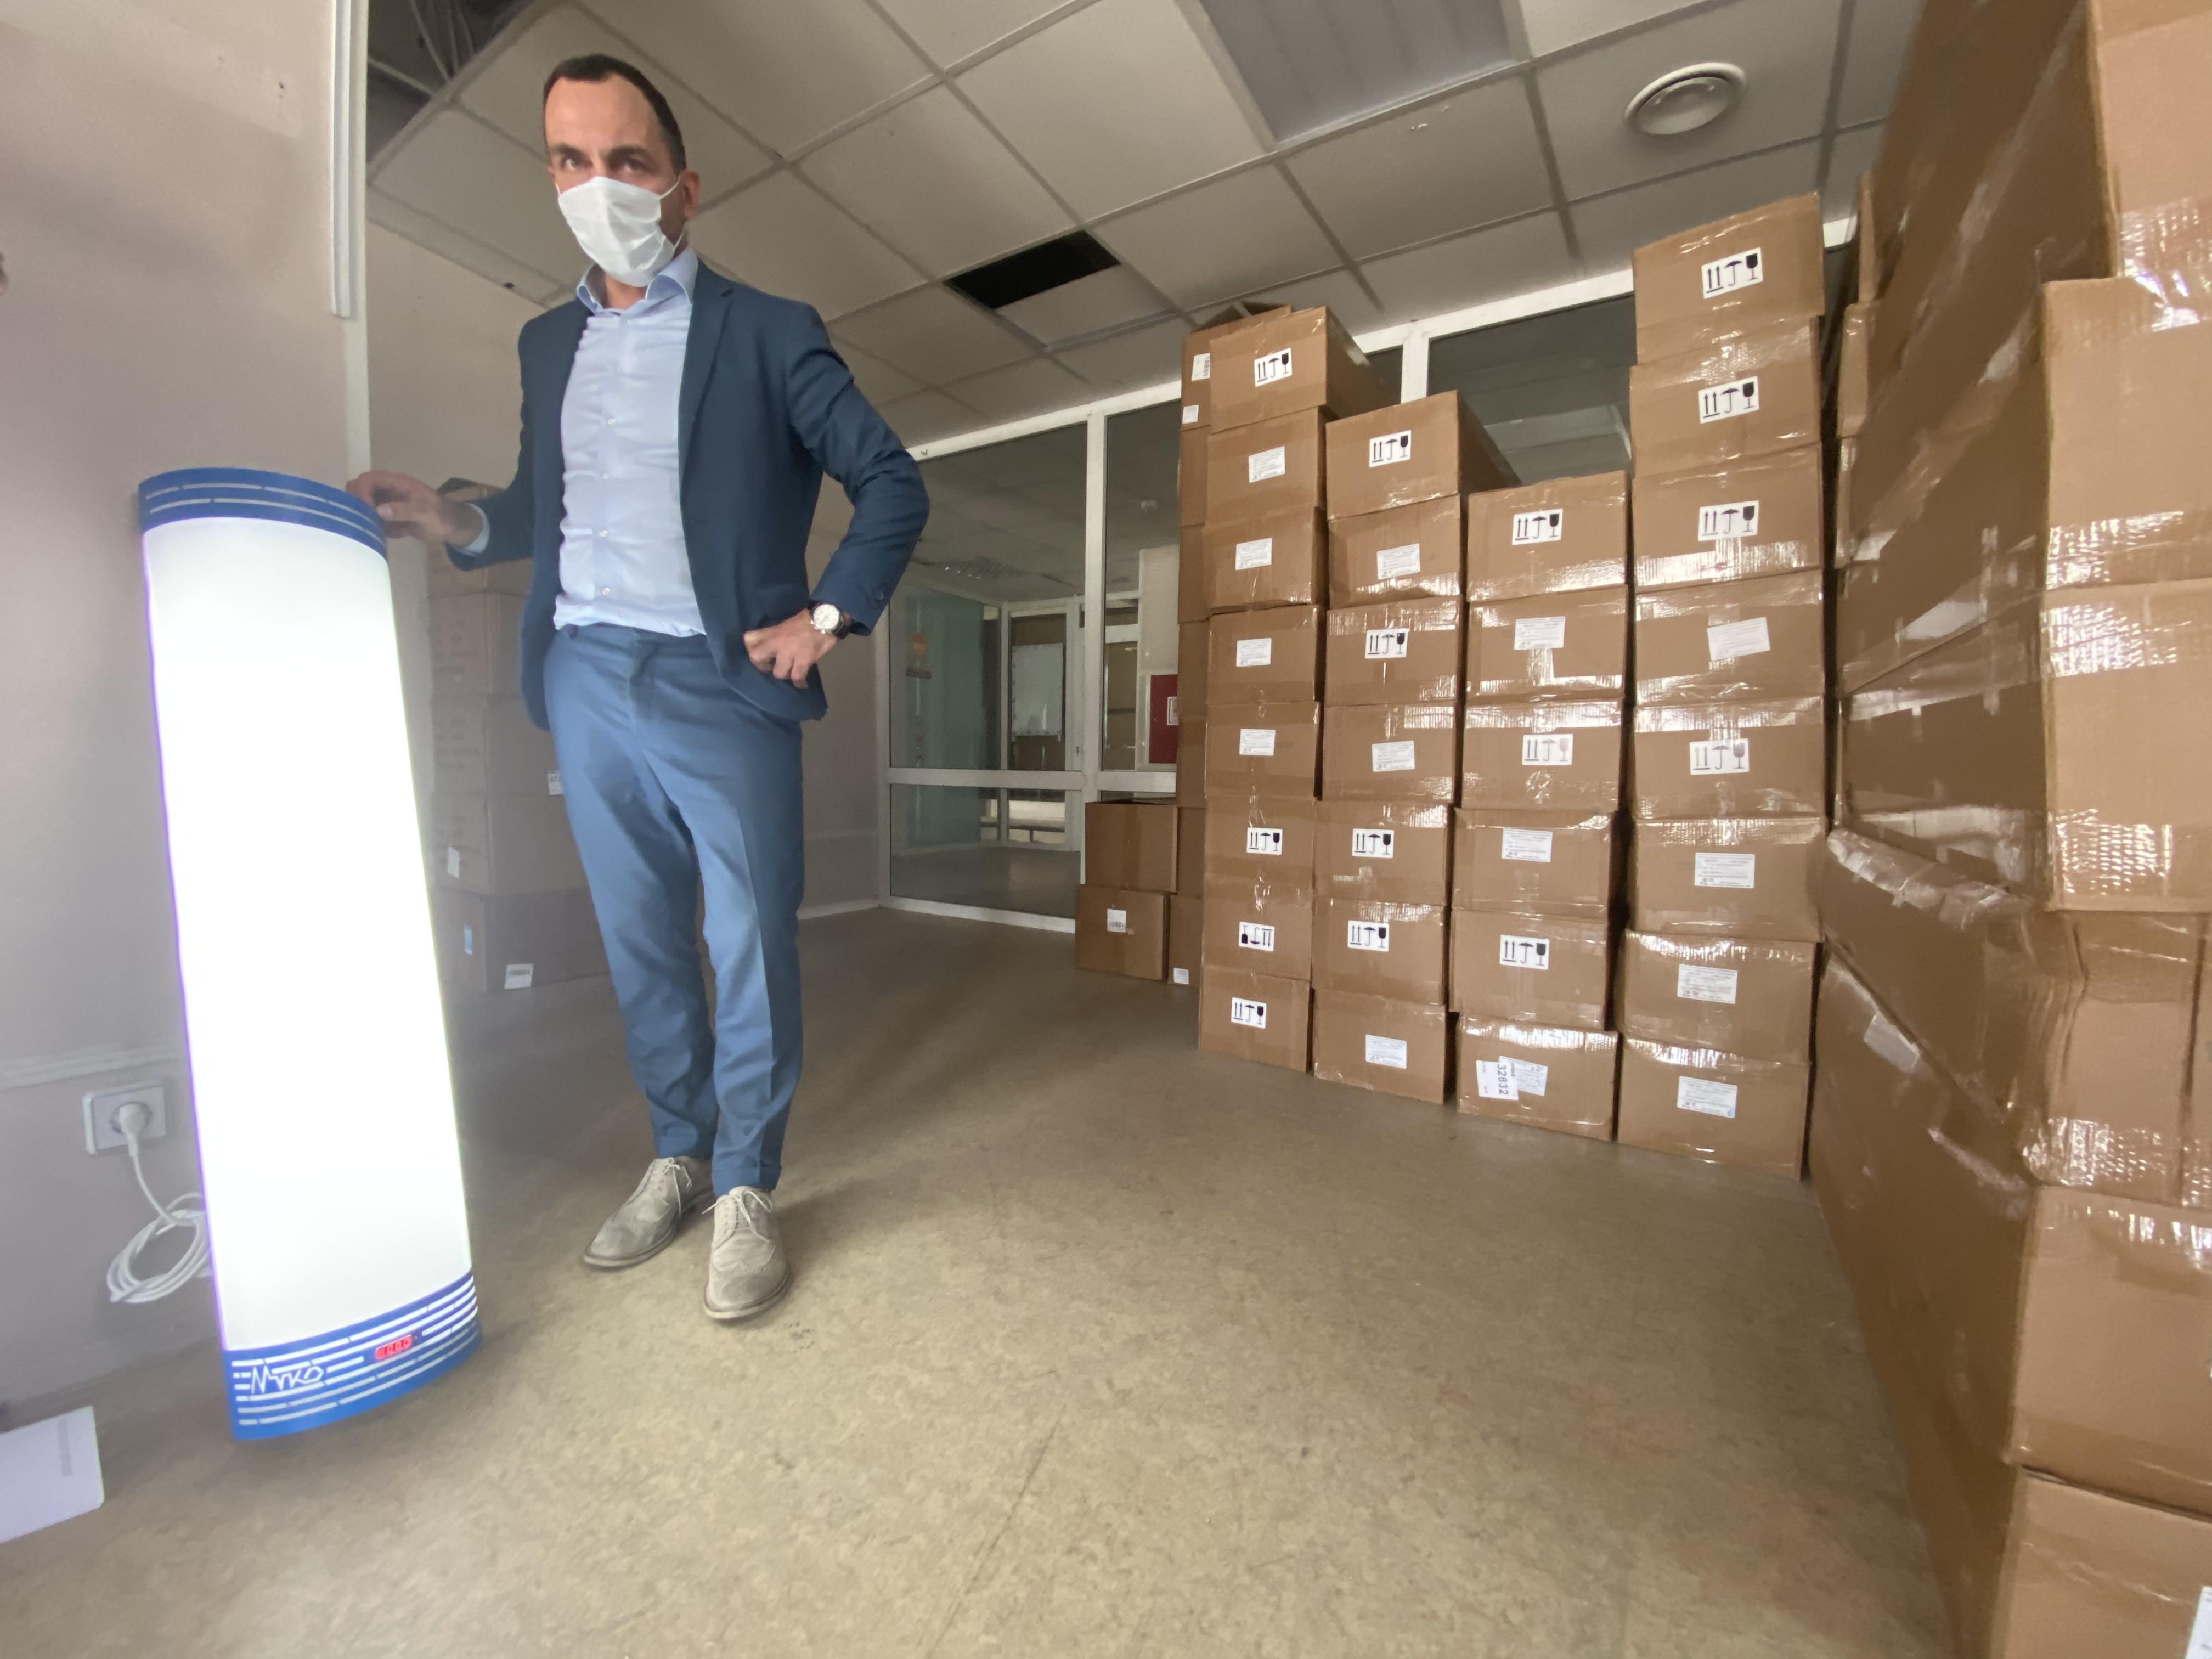 Фитнес-центры получат бактерицидные лампы